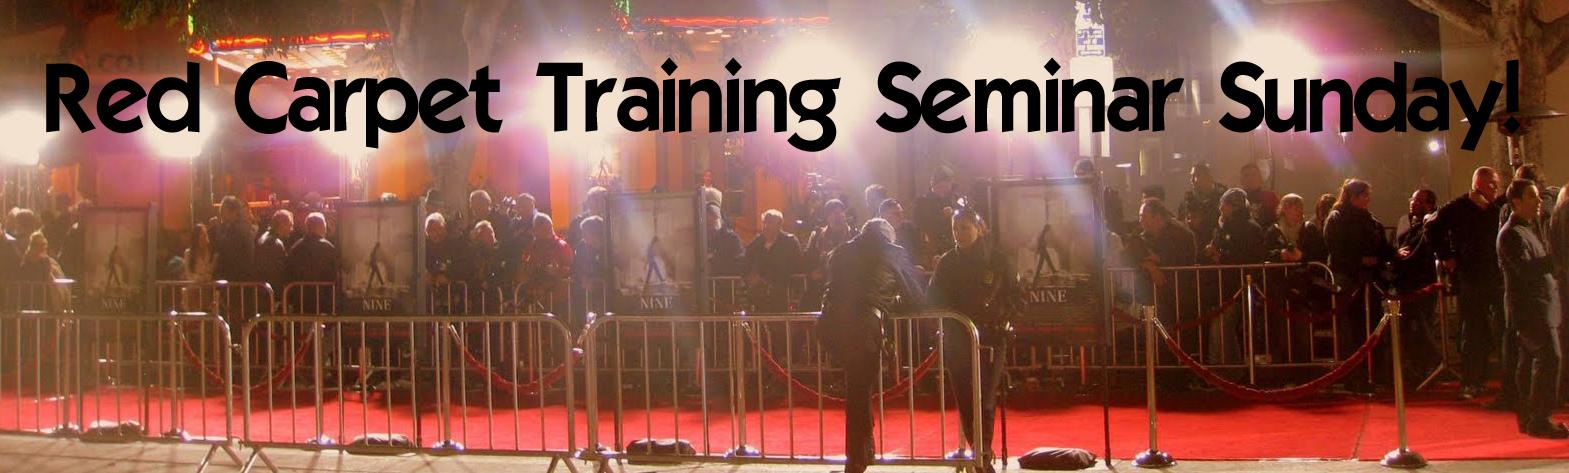 Red Carpet Training Sunday